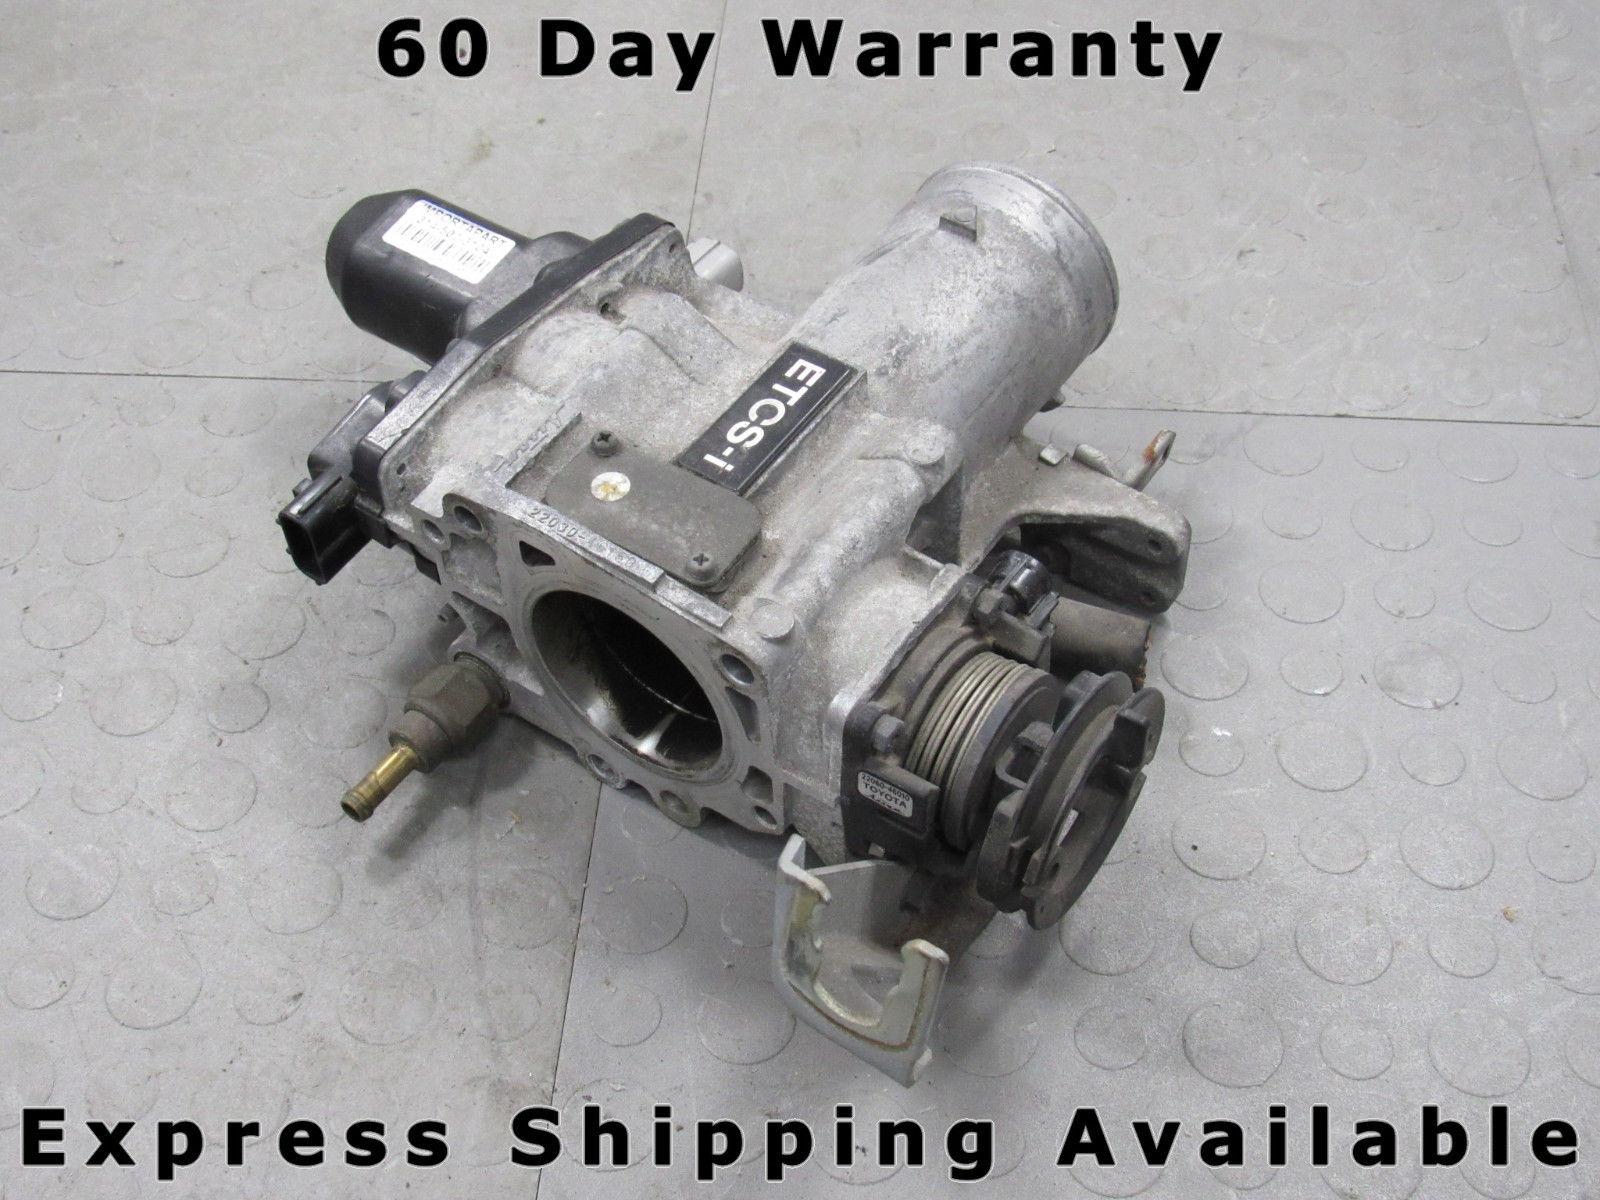 hight resolution of 98 00 lexus gs300 etcs i throttle body acuator assembly w tps 22030 46150 xi